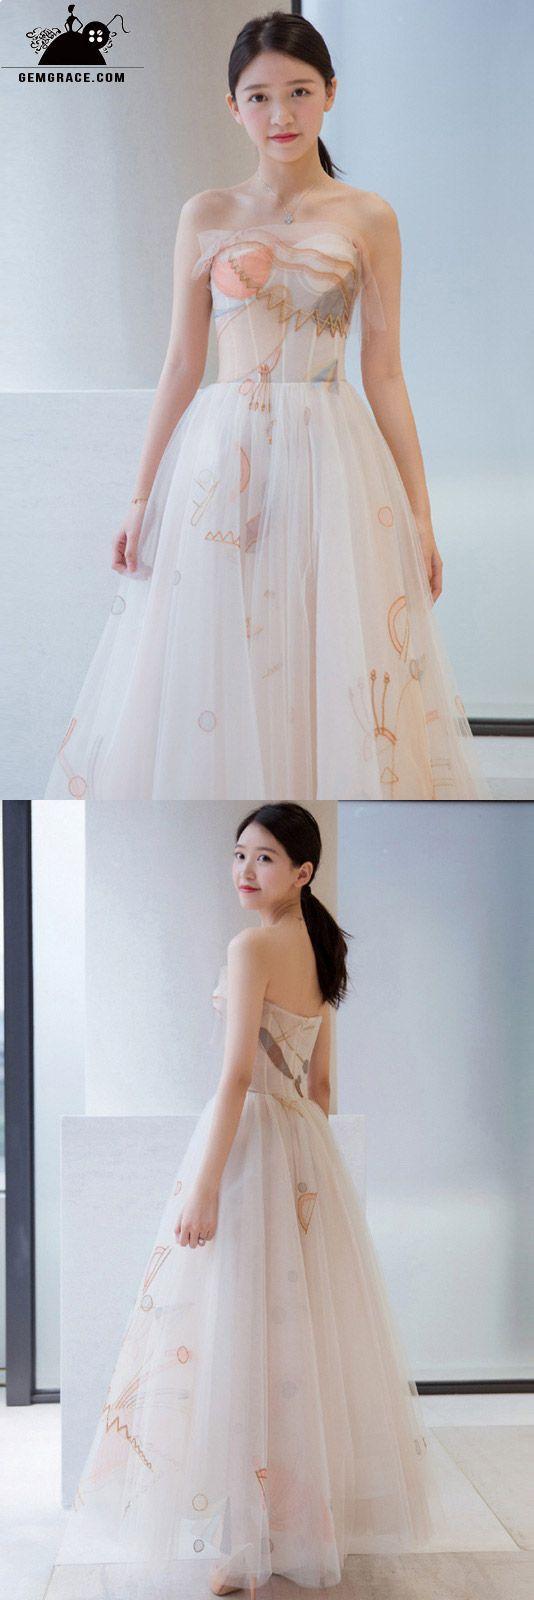 Special printed strapless boho wedding dress bohoinspired wedding